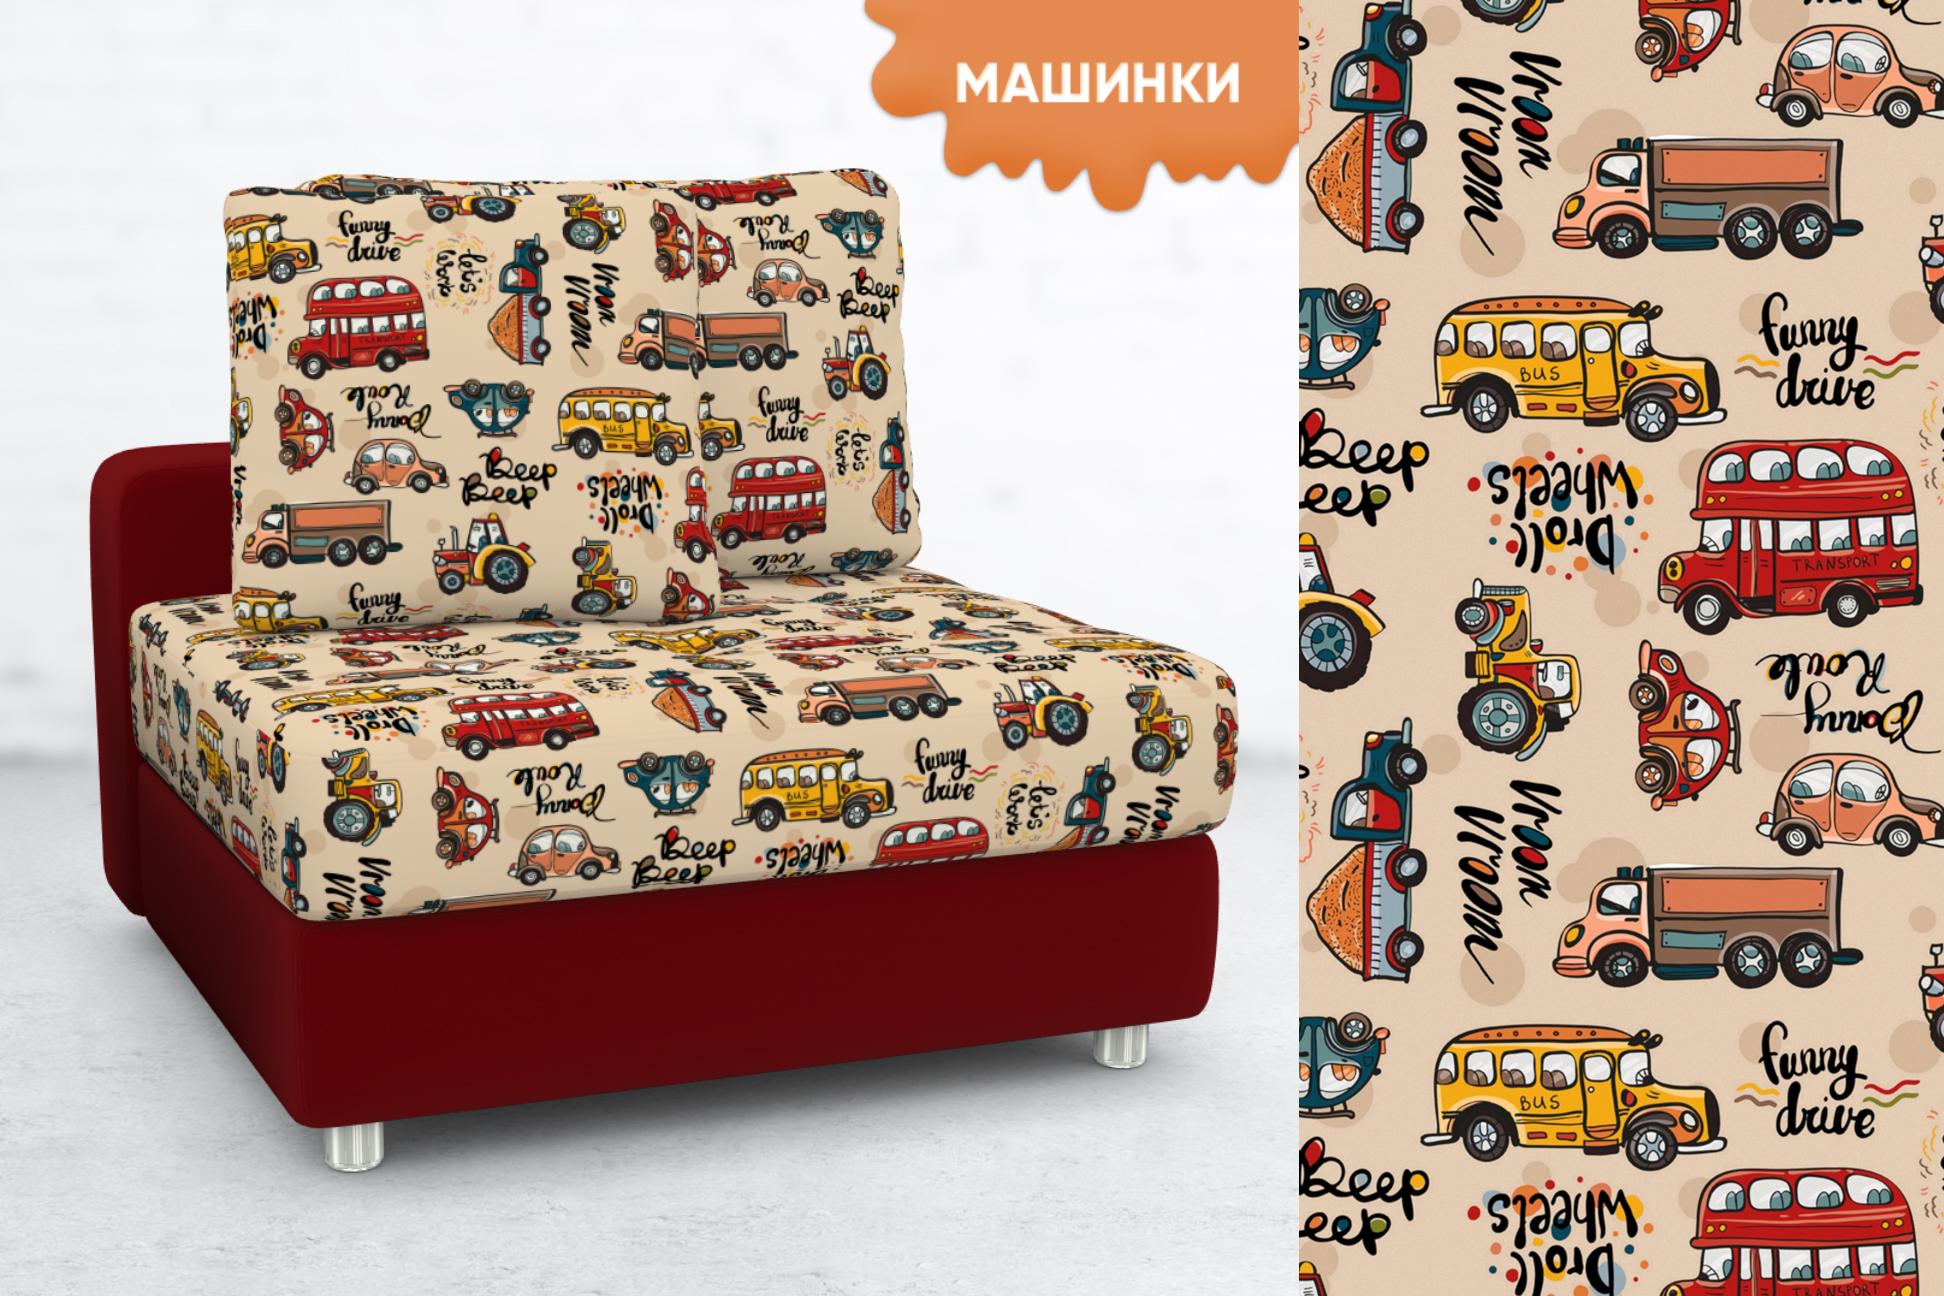 Mashinki_slider_3